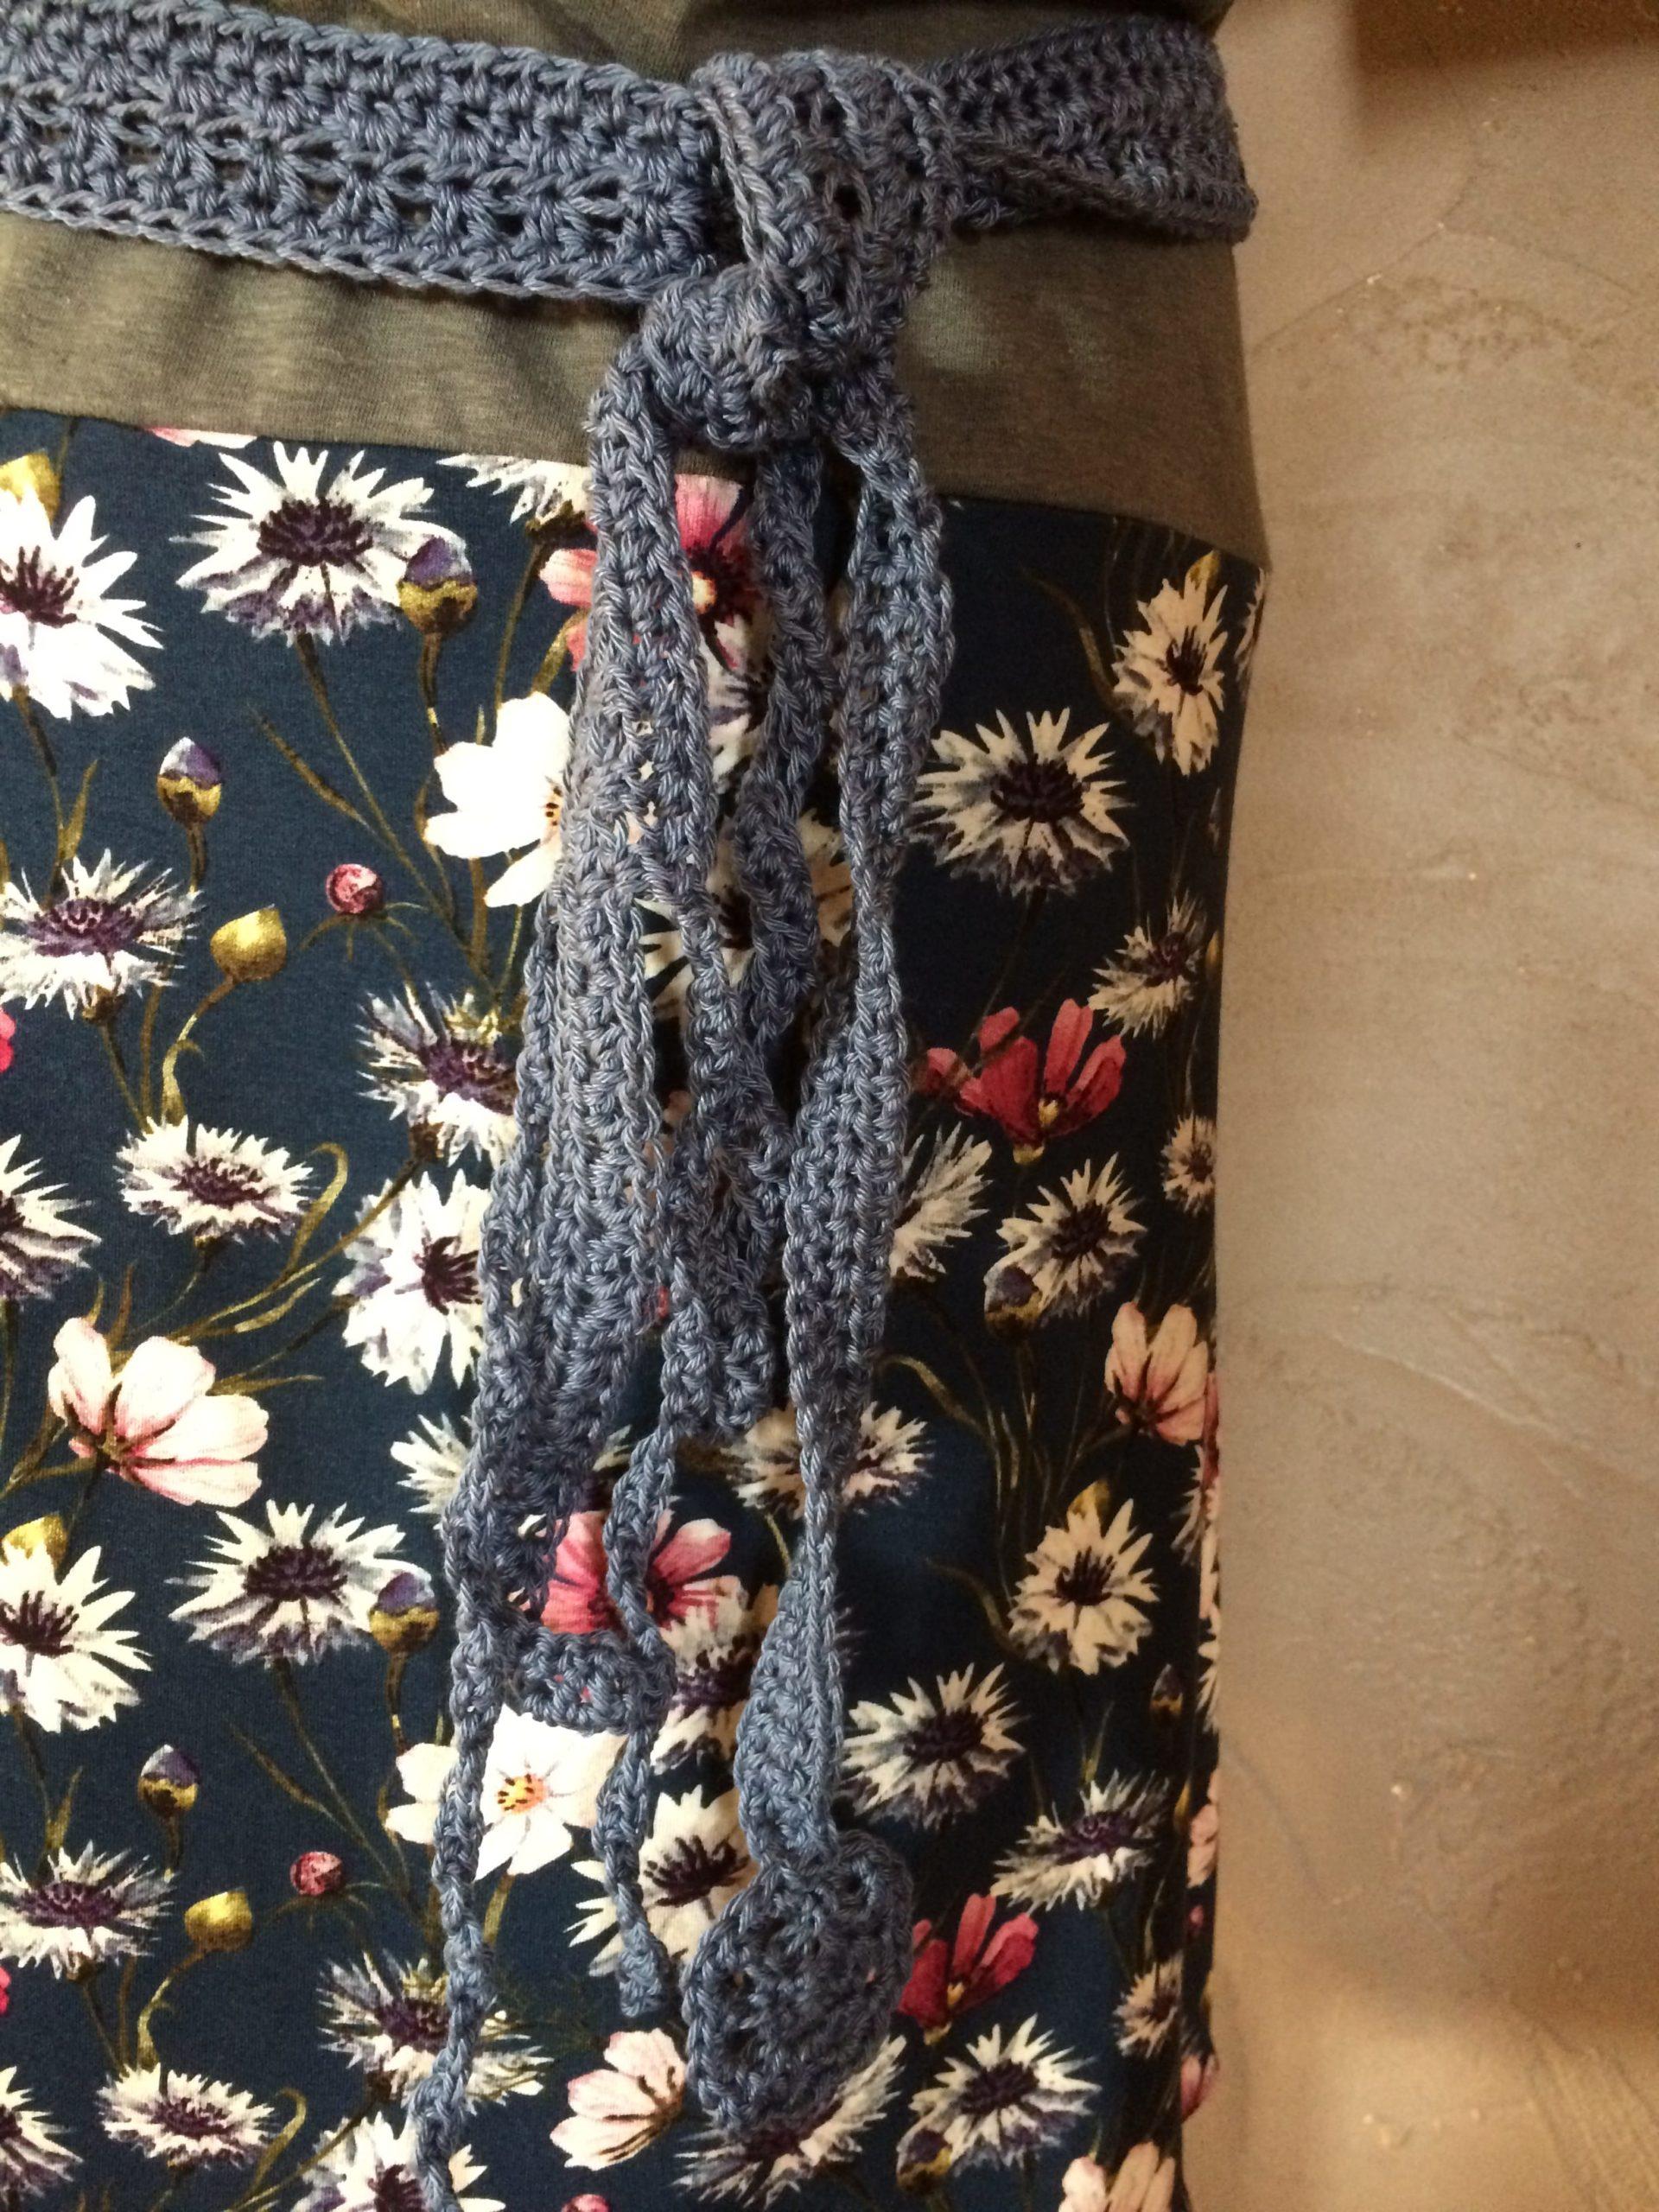 Ceinture robe kaki et fleuri marine